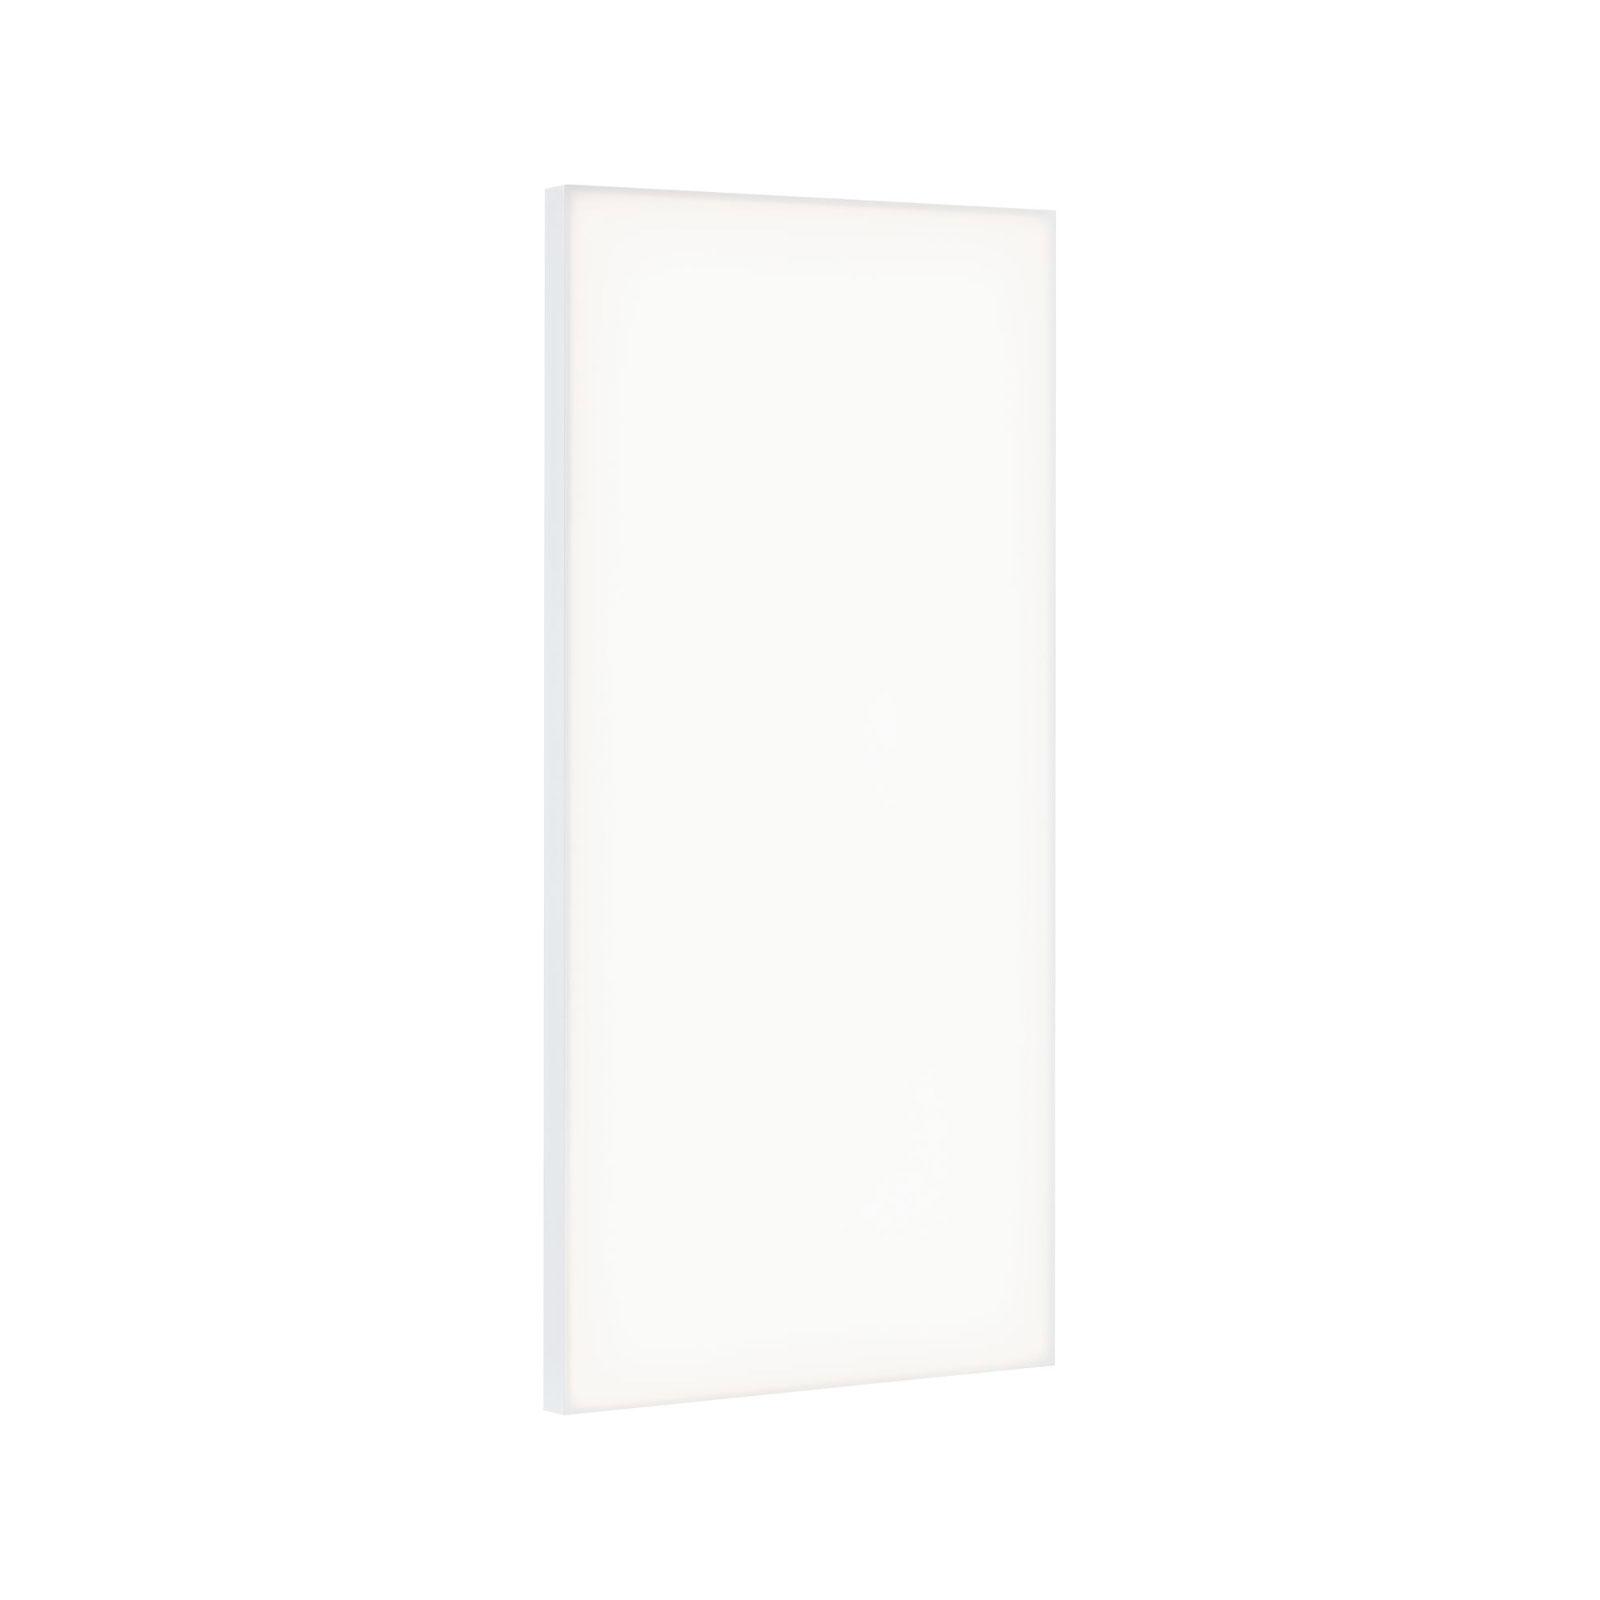 Paulmann Velora LED-Deckenleuchte 59,5 x 29,5cm